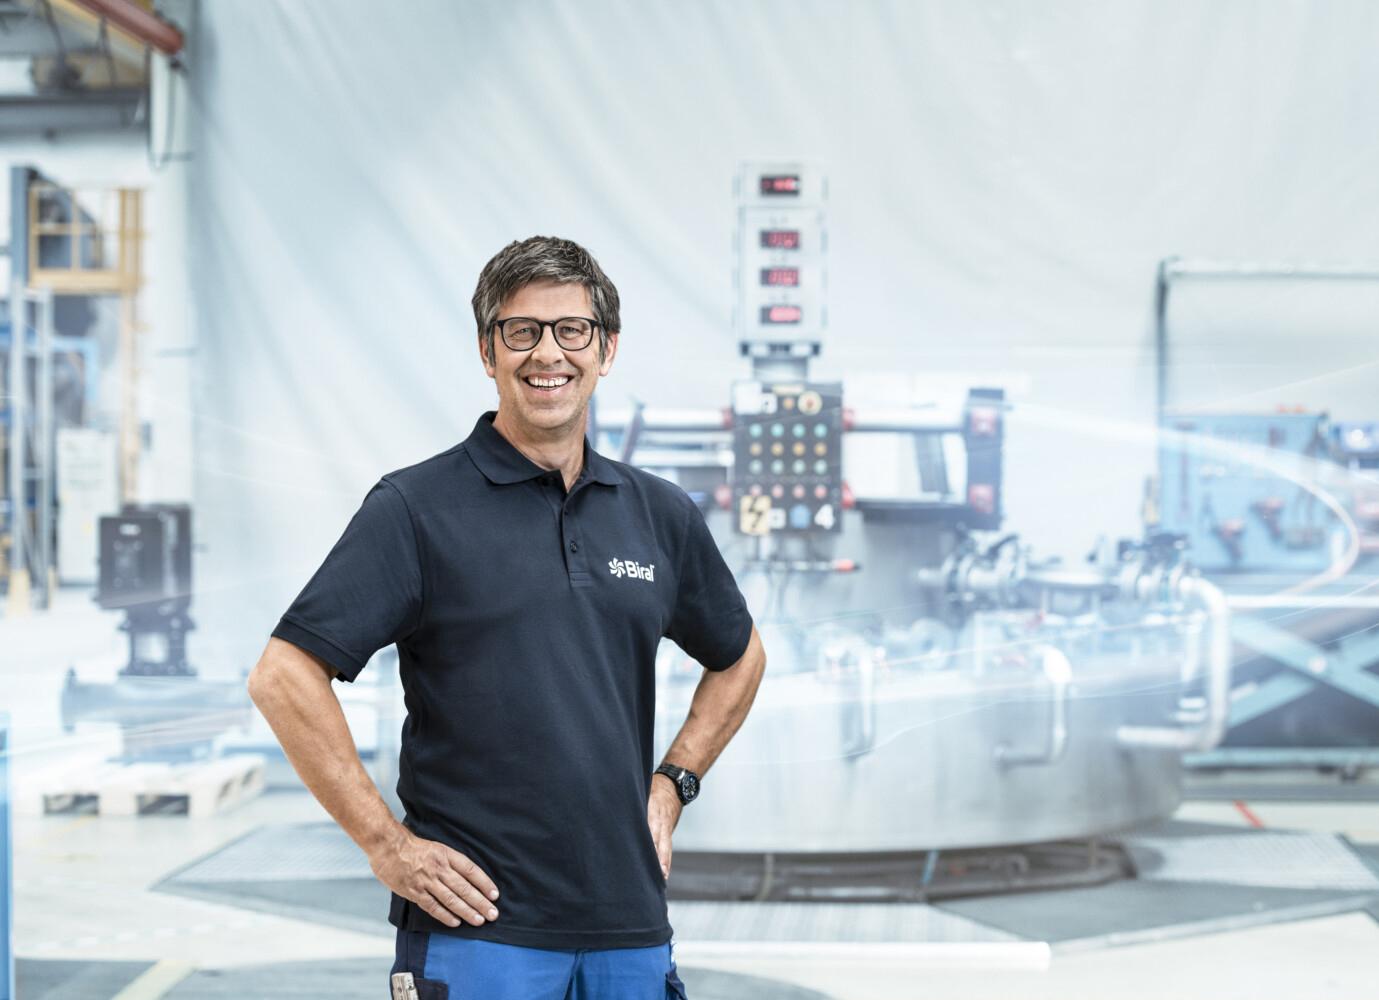 Melchior Zürcher, Production and Logistics Director